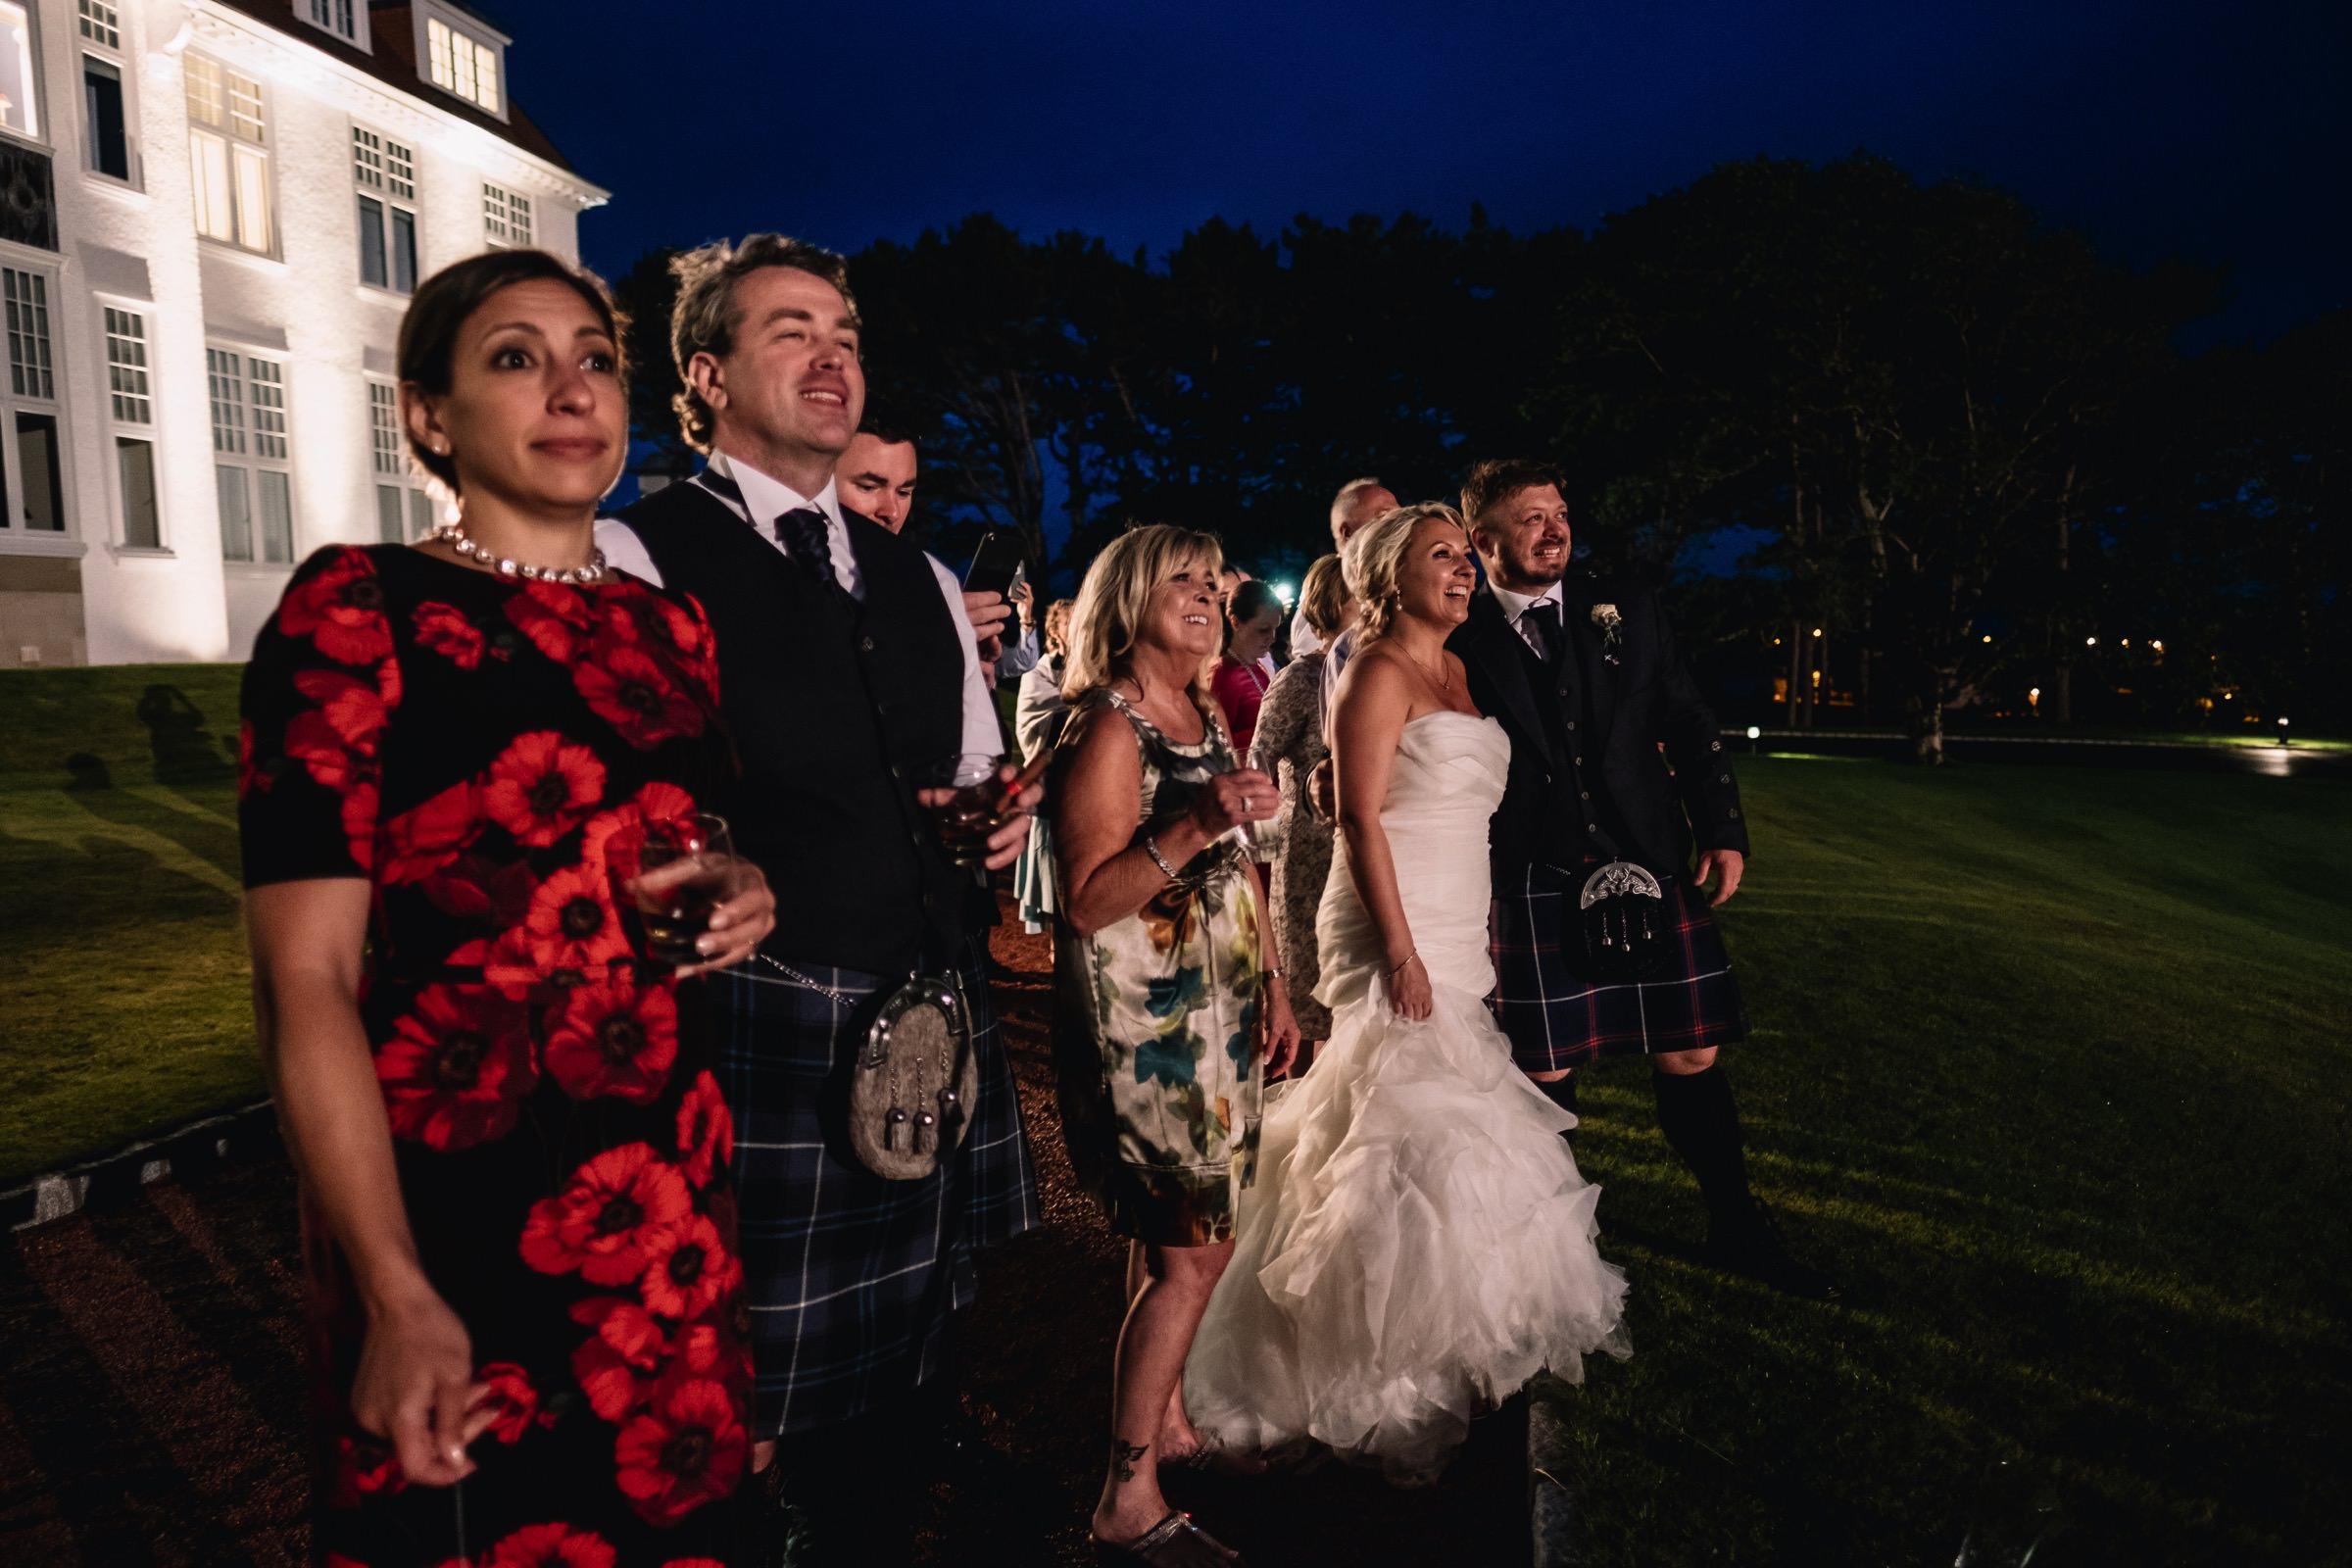 Wedding guests watch fireworks